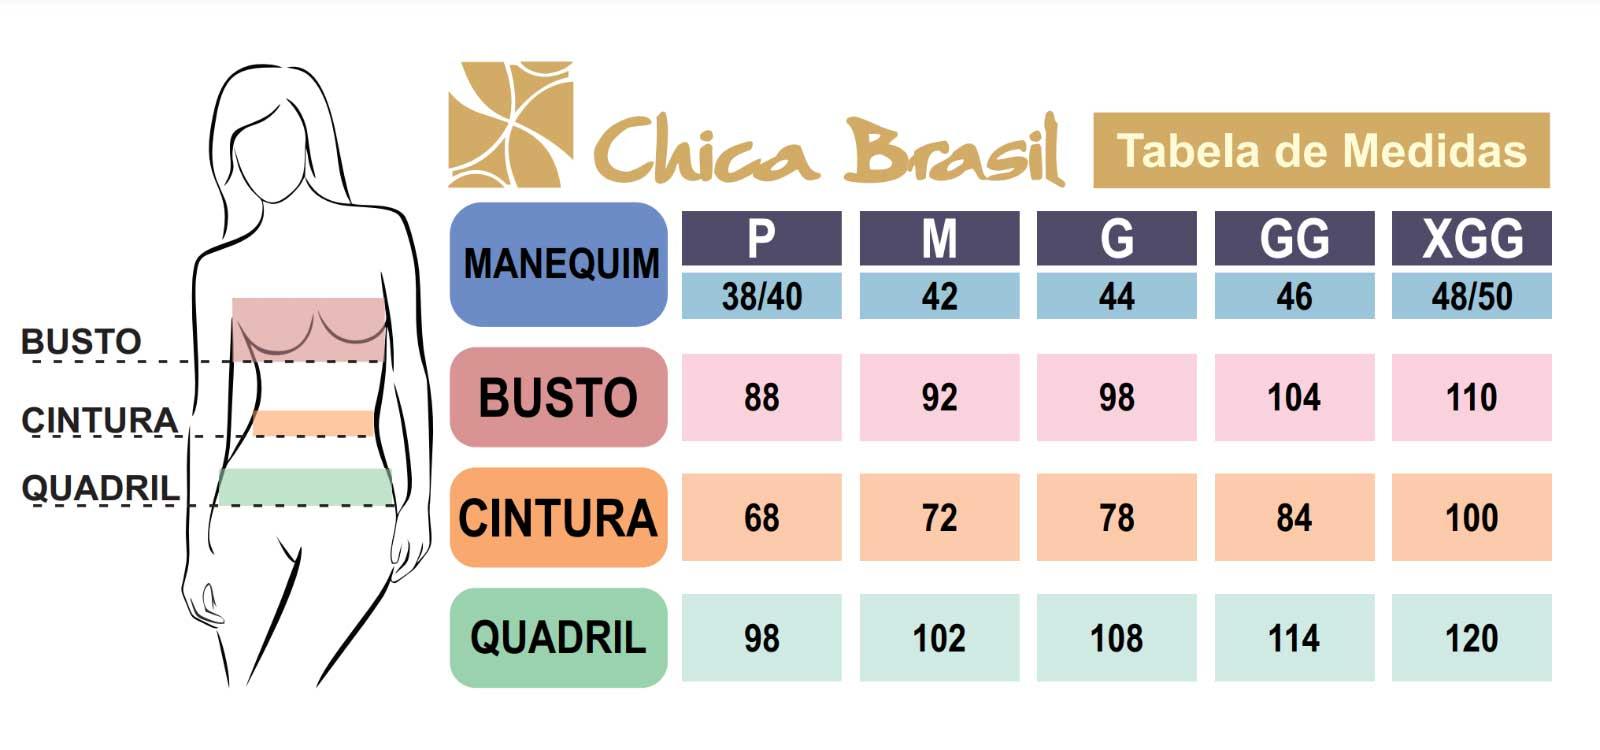 Tabela de Medidas Chica Brasil